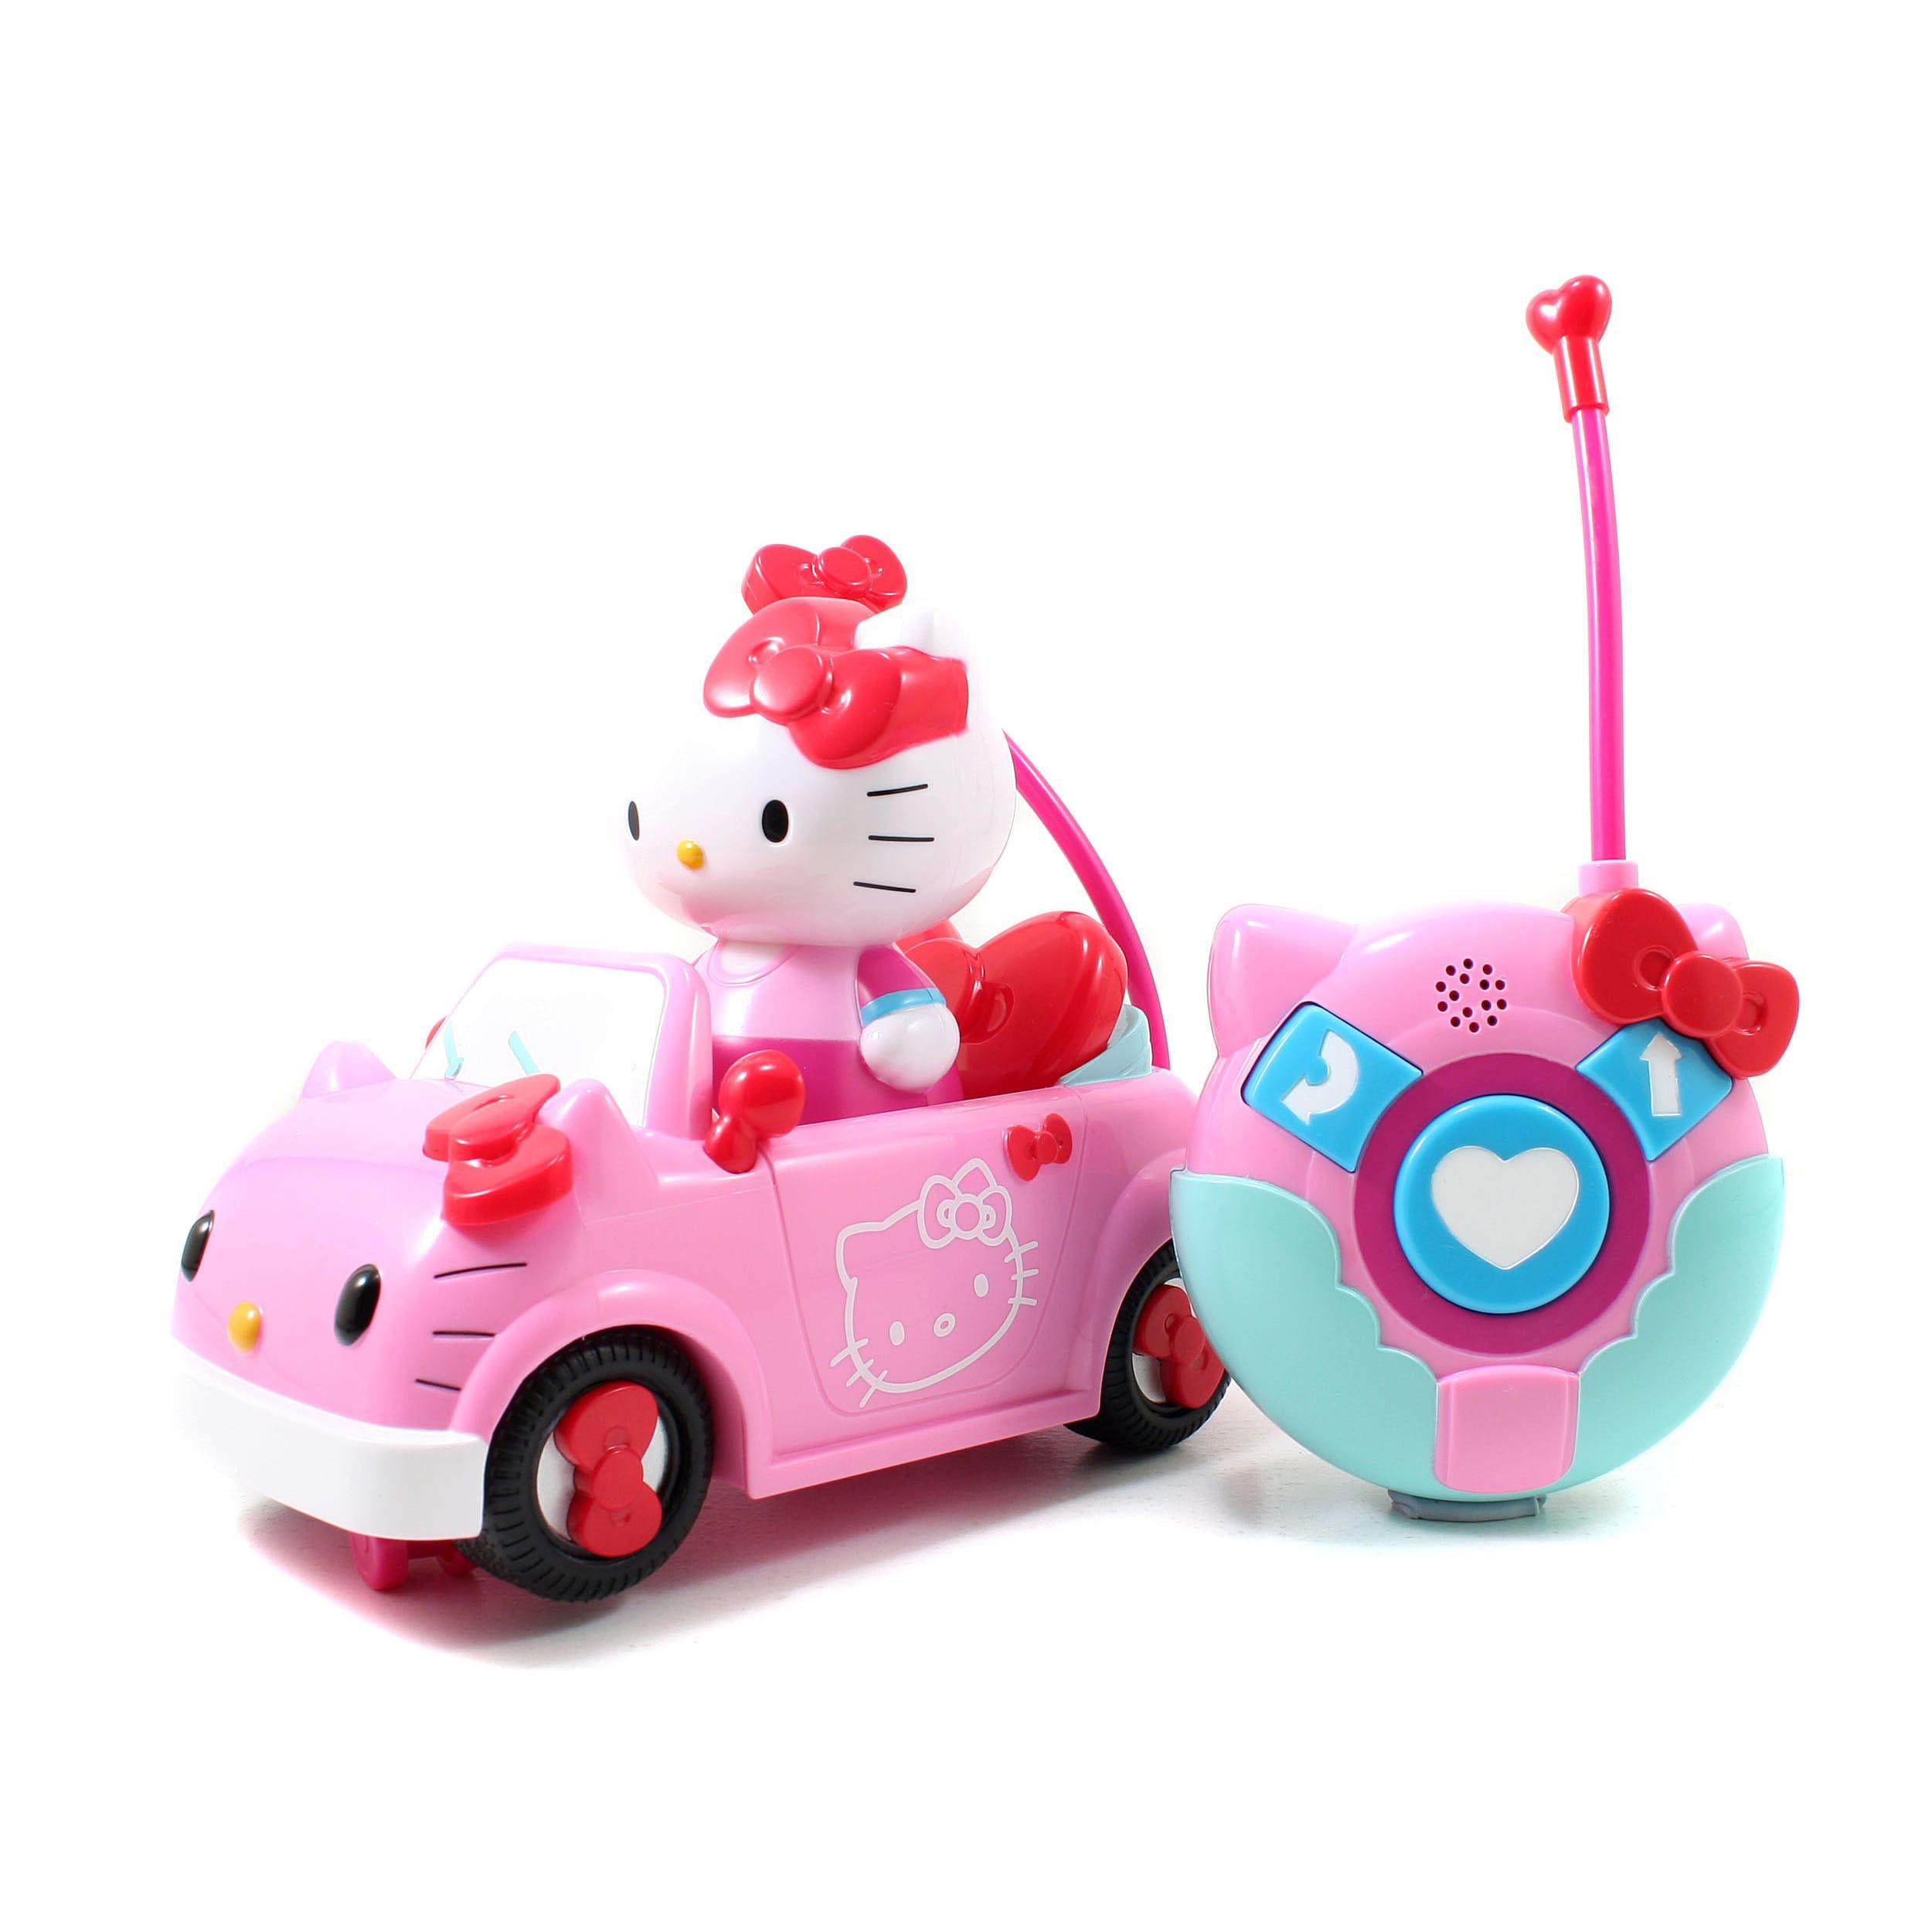 Jada Toys Hello Kitty Radio Control Vehicle (1), Multi